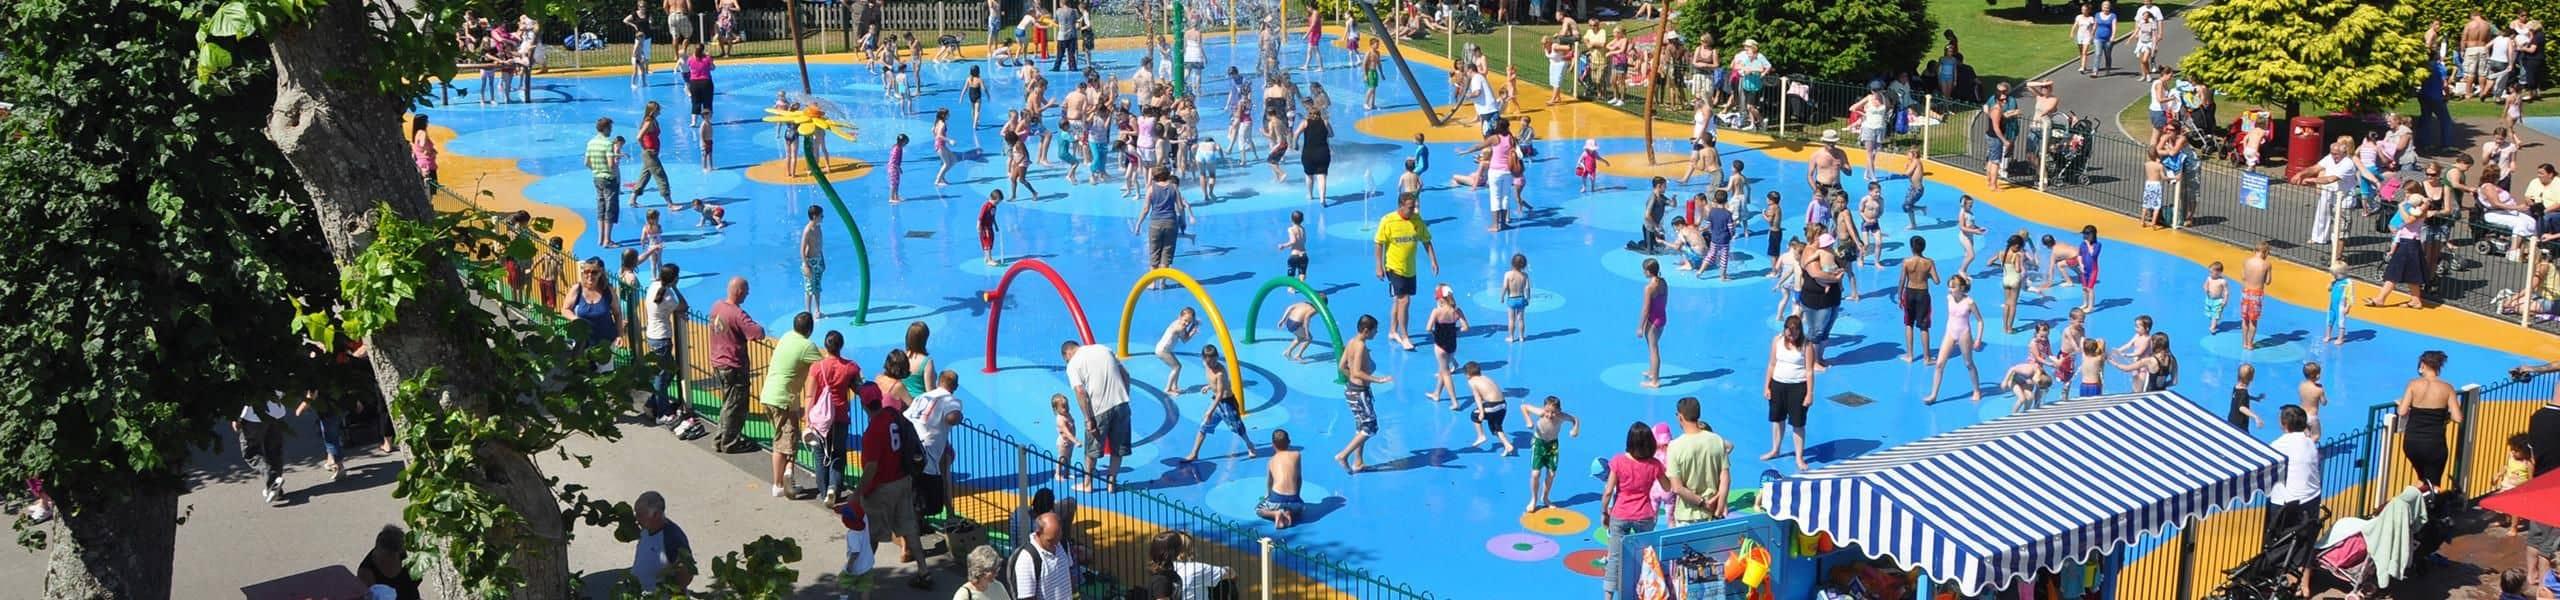 Water Kingdom Splash Park | Paultons Park